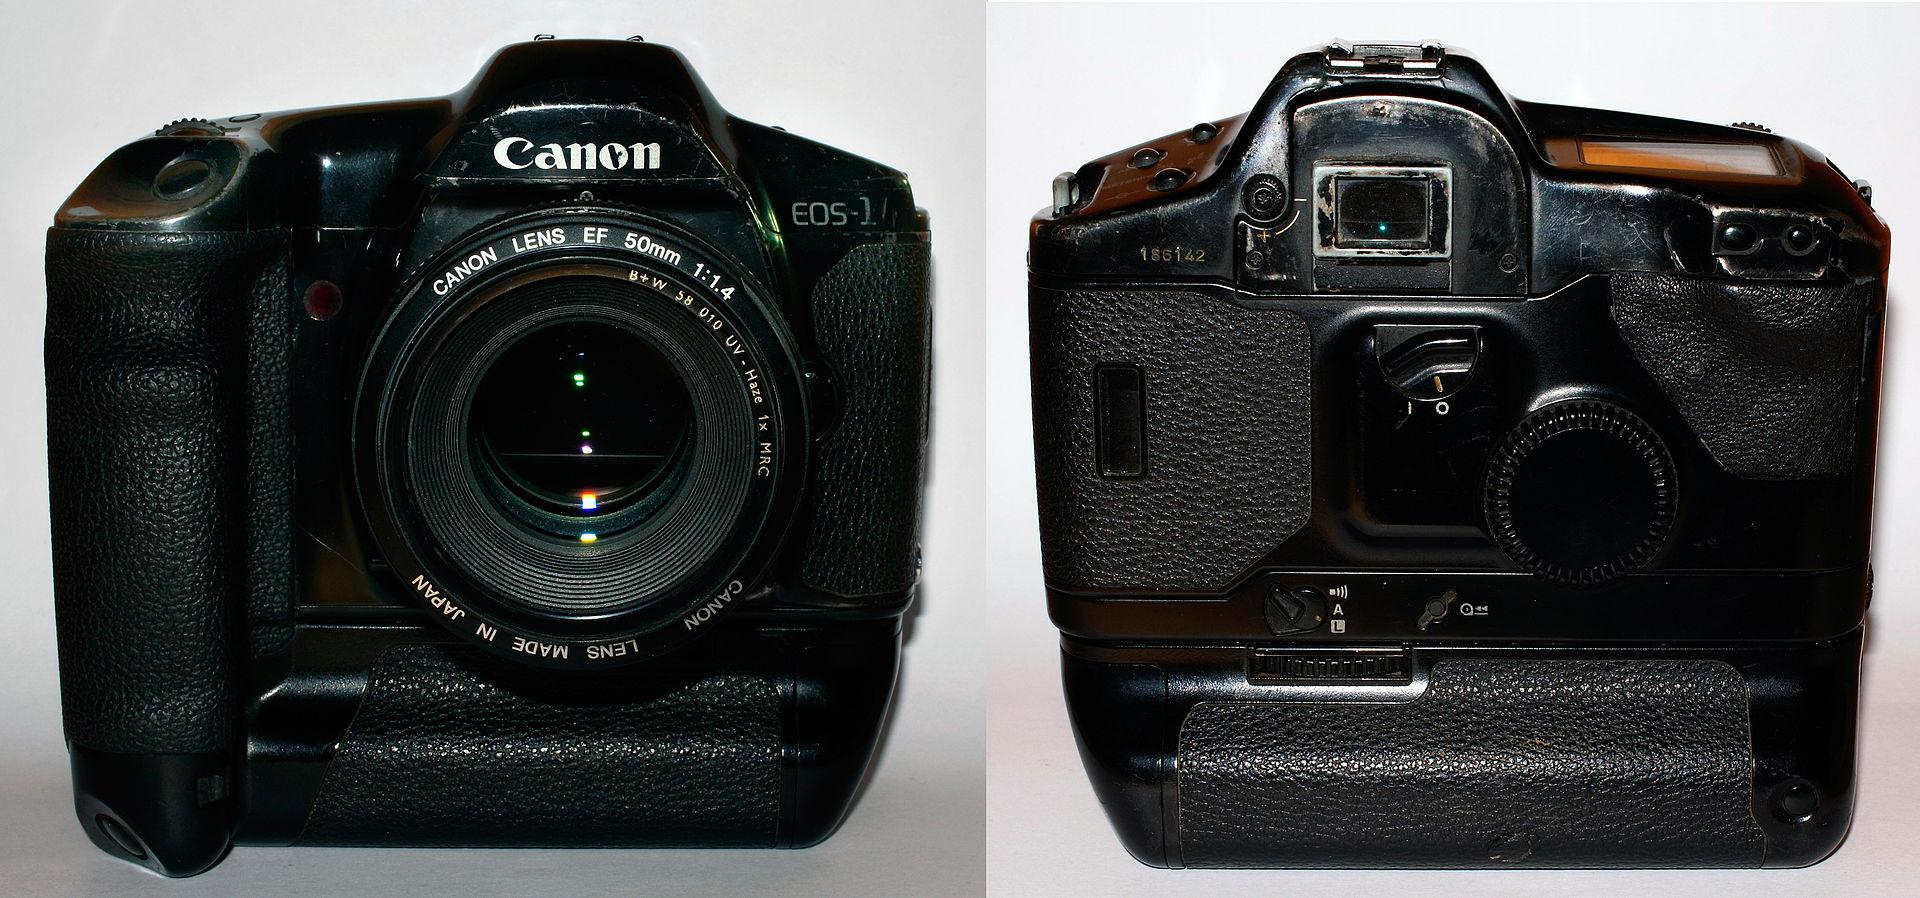 https://upload.wikimedia.org/wikipedia/commons/thumb/1/1f/Canon_EOS_1_kpl.jpg/1920px-Canon_EOS_1_kpl.jpg